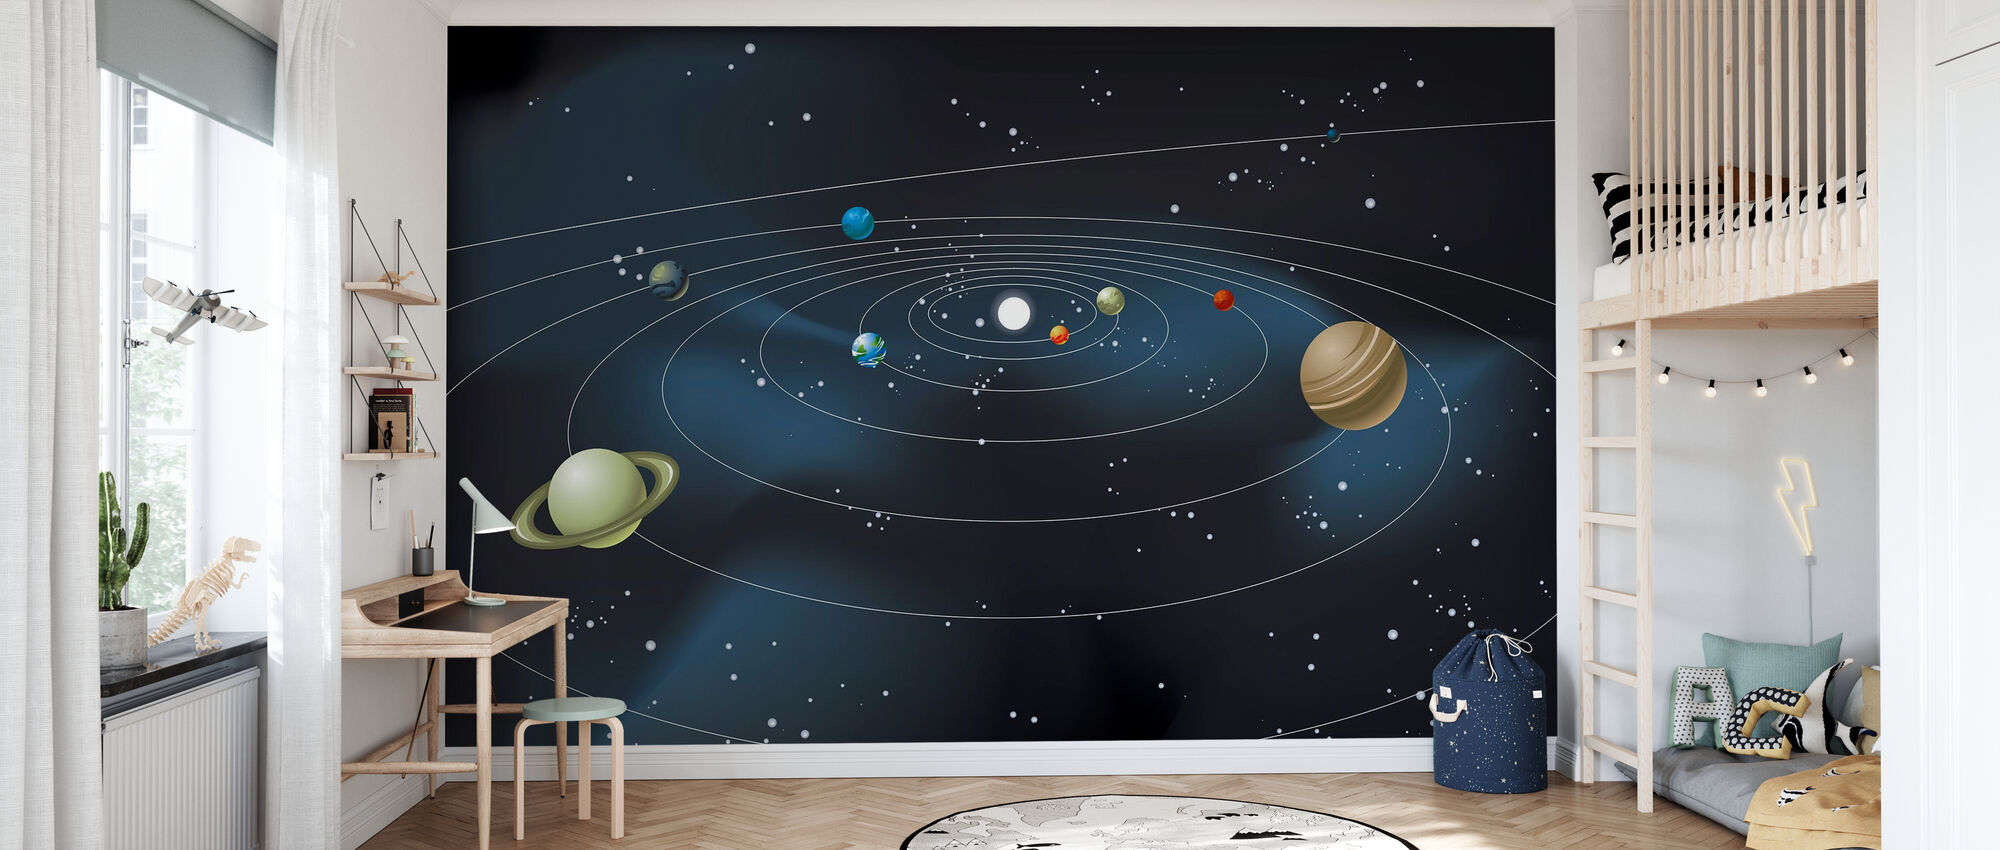 Planetary System - Wallpaper - Kids Room